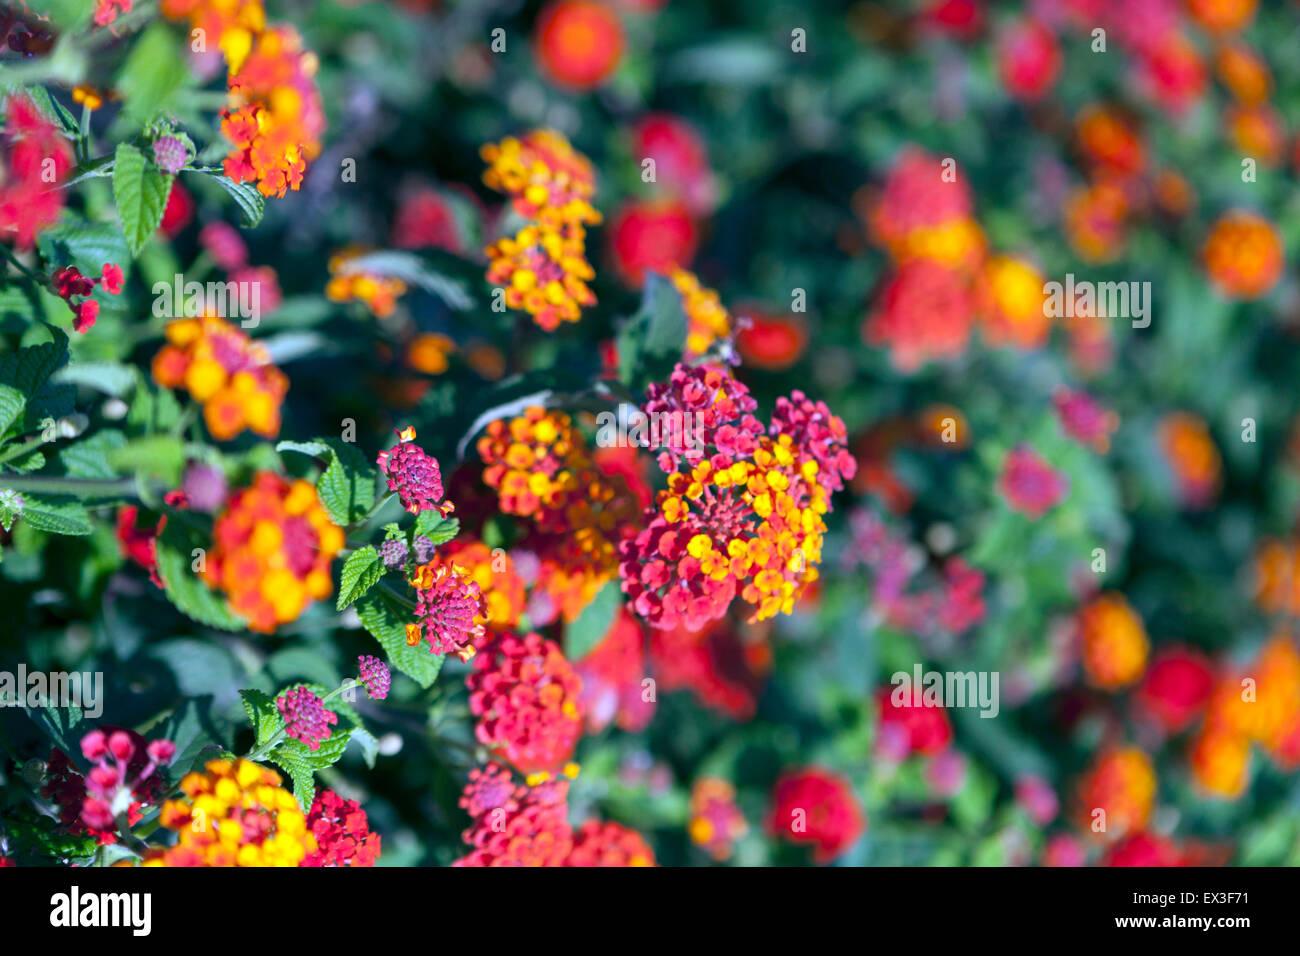 Lantana flowers (Lantana camara), Crete, Greece, Europe - Stock Image